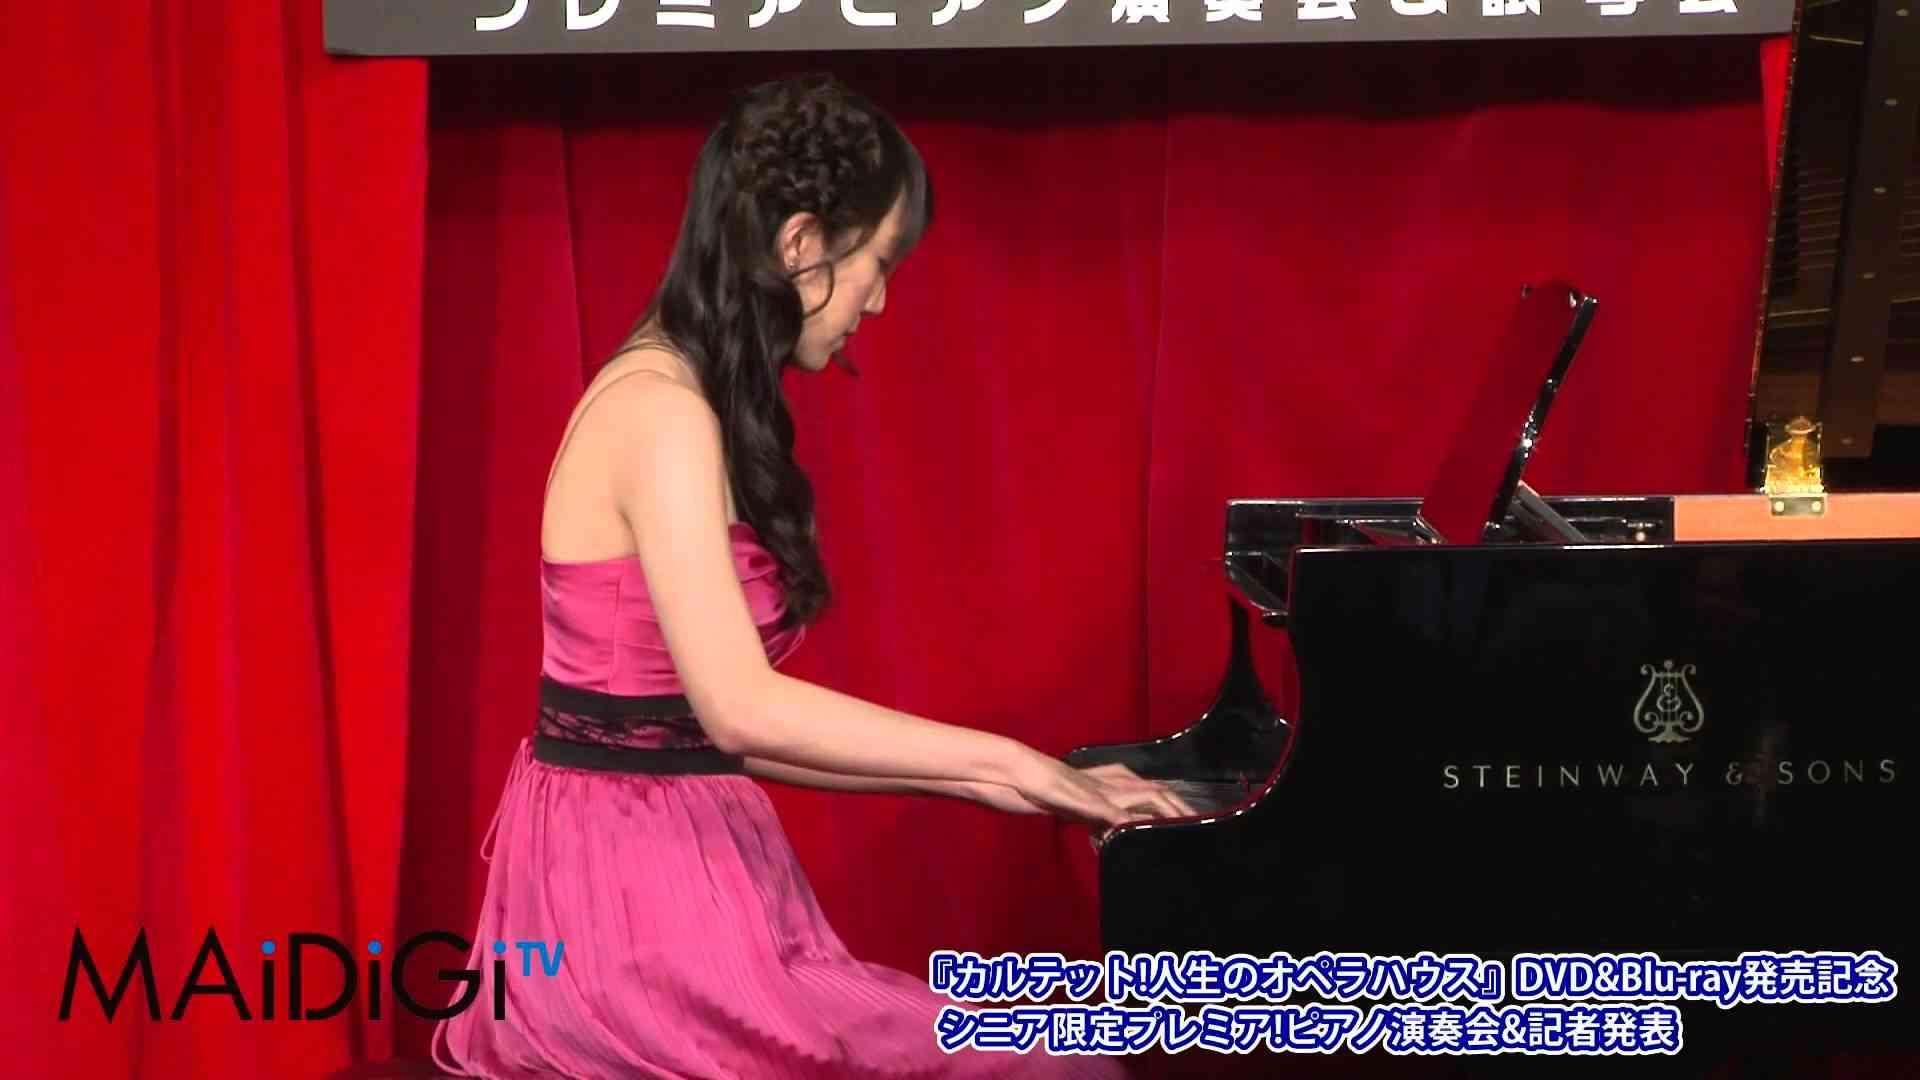 AKB48  松井咲子 がピアノを披露! 『カルテッ卜!人生のオペラハウス』DVD&Blu ray発売記念 - YouTube